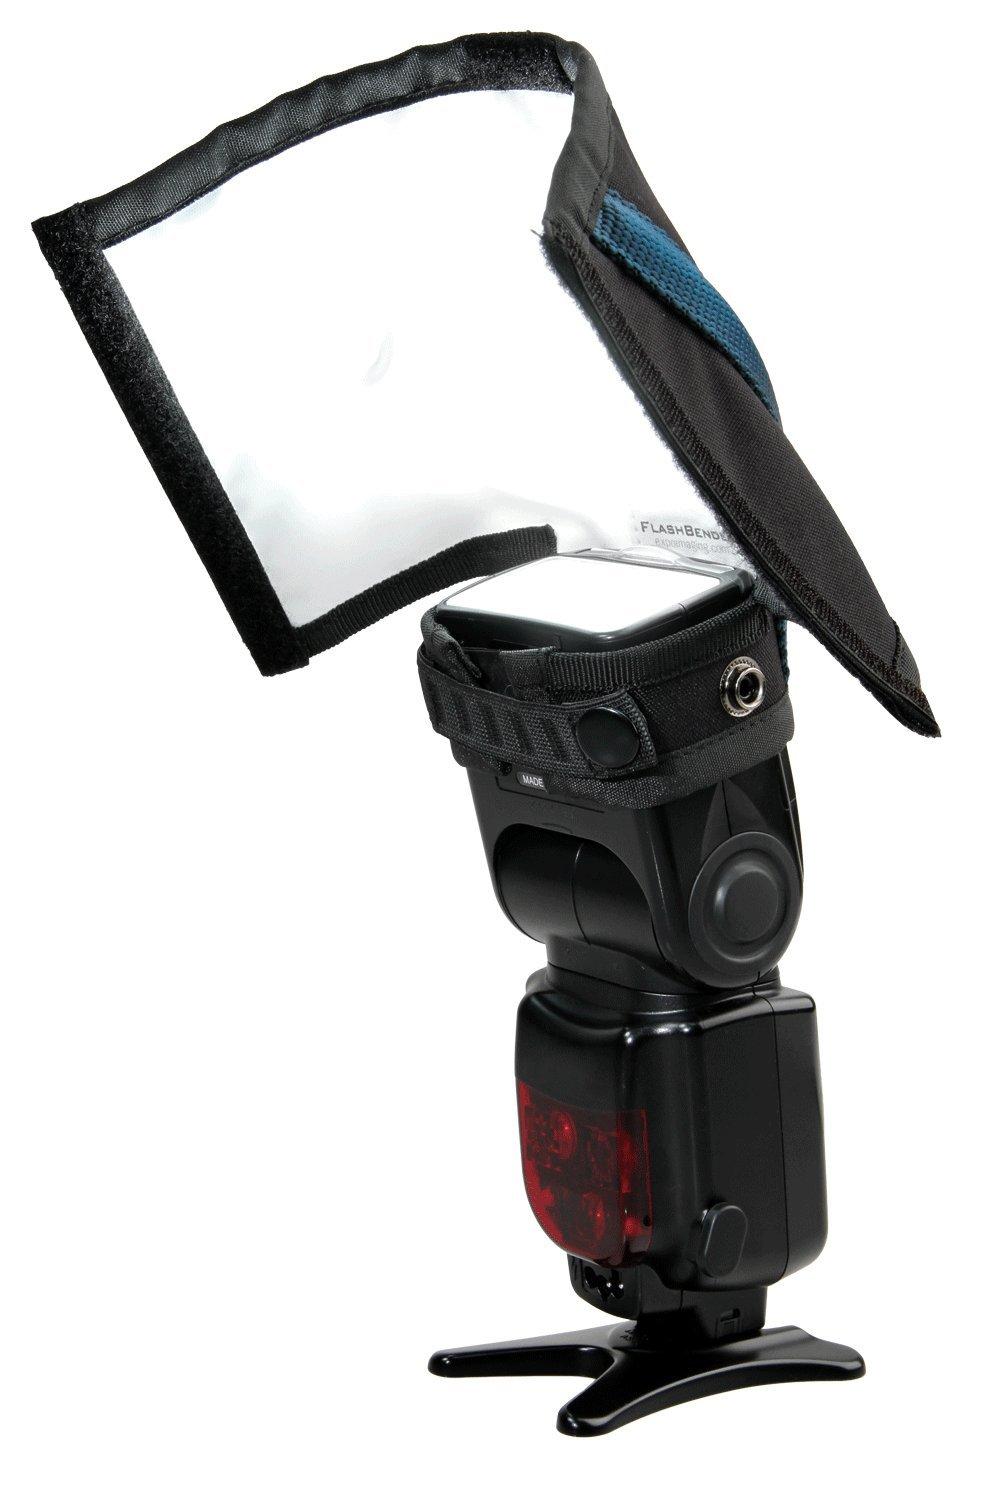 Rogue FlashBenders ROGUERESM Small Positionable Reflector